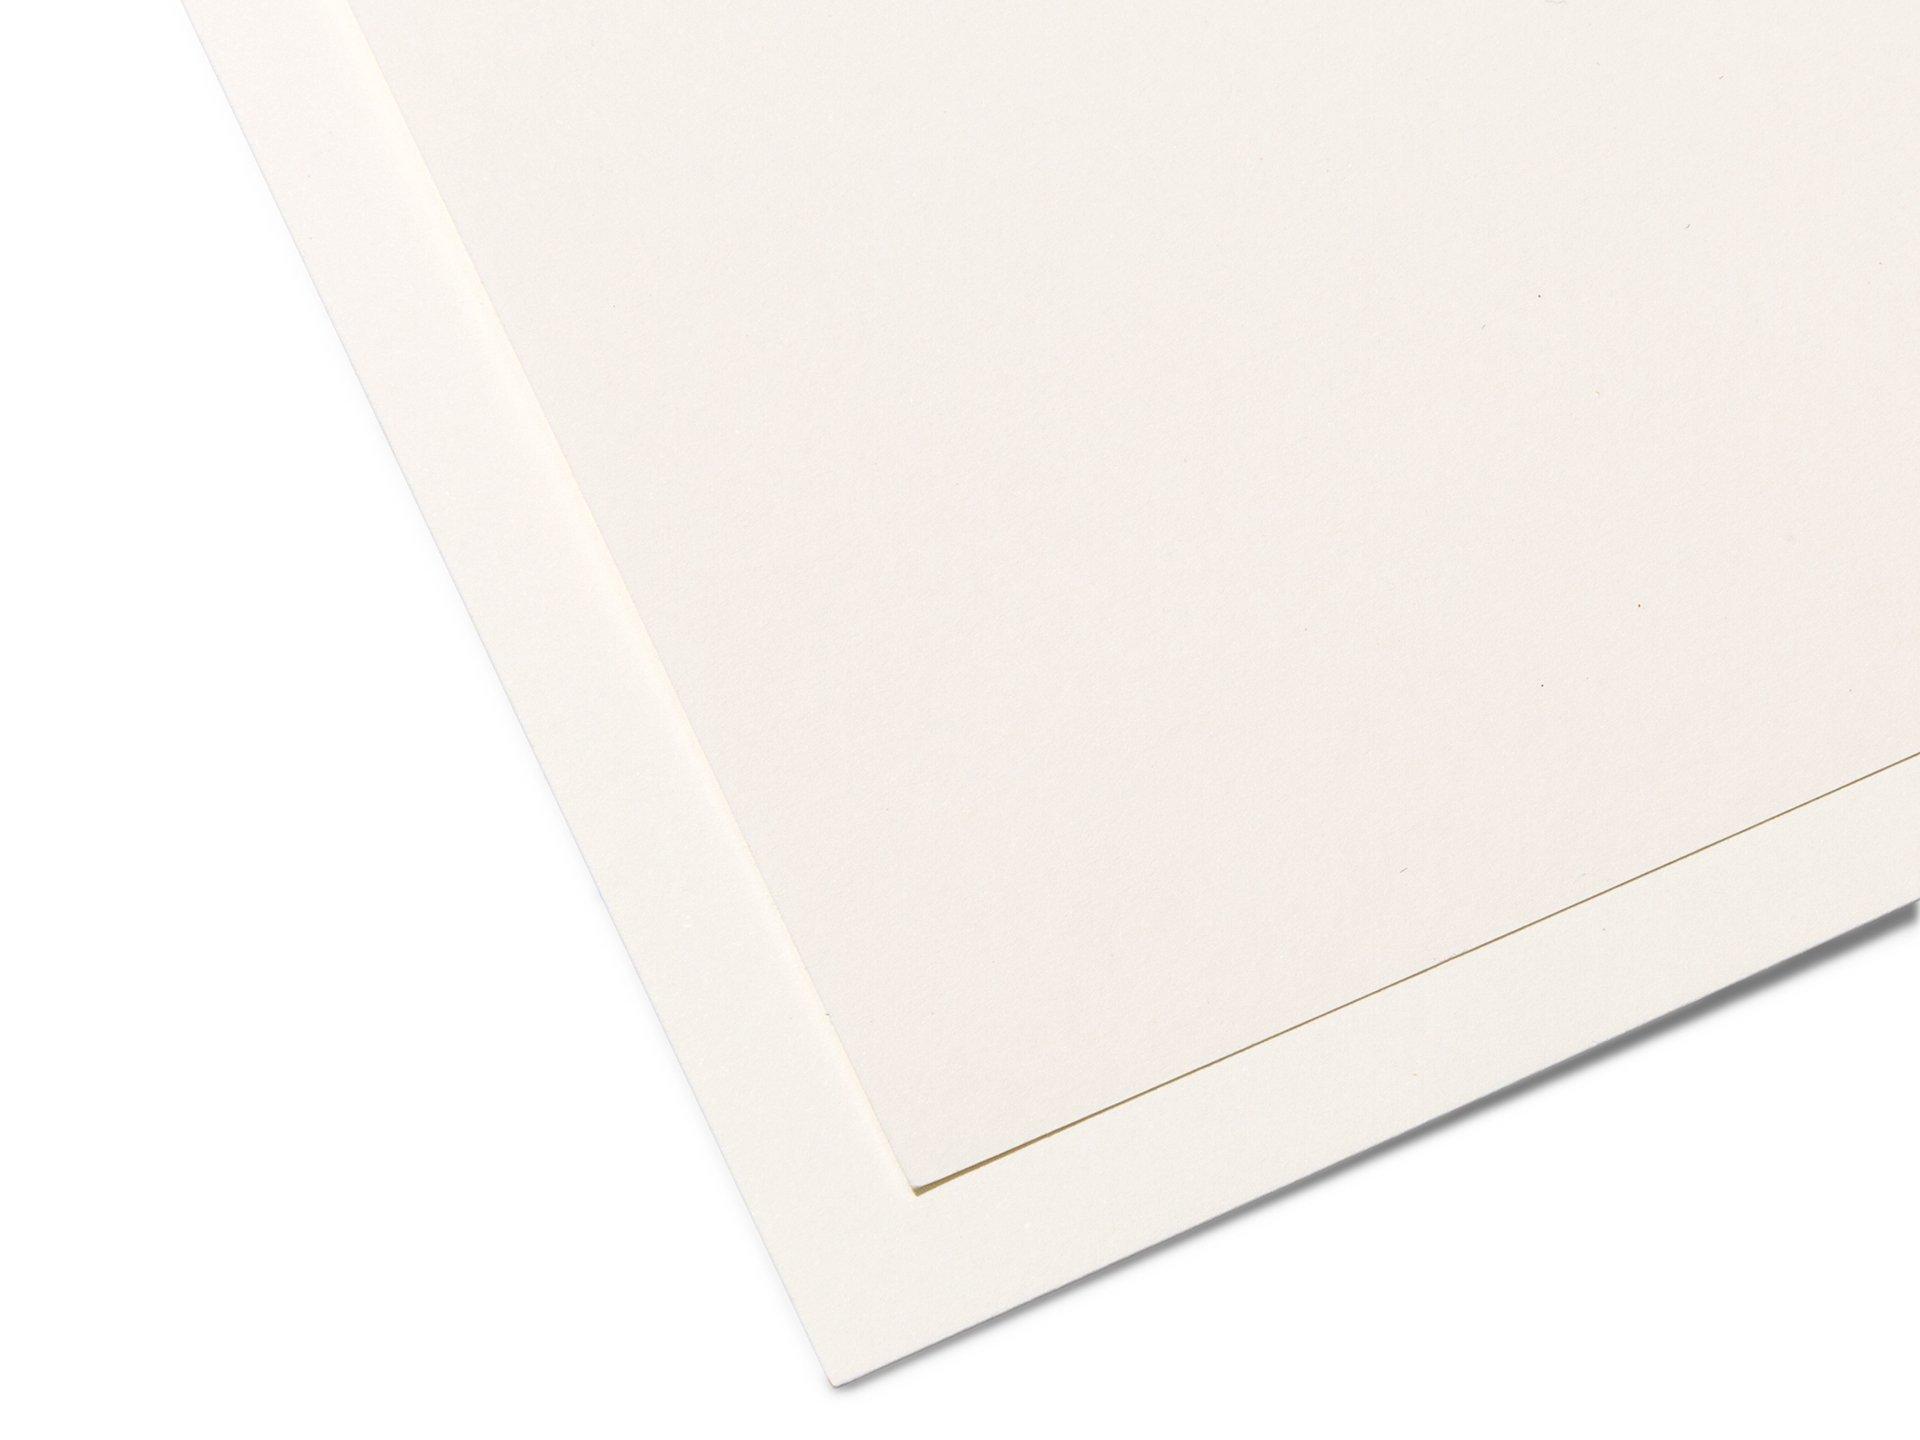 Buy Drawing book Printing Paperboard Smooth Online At